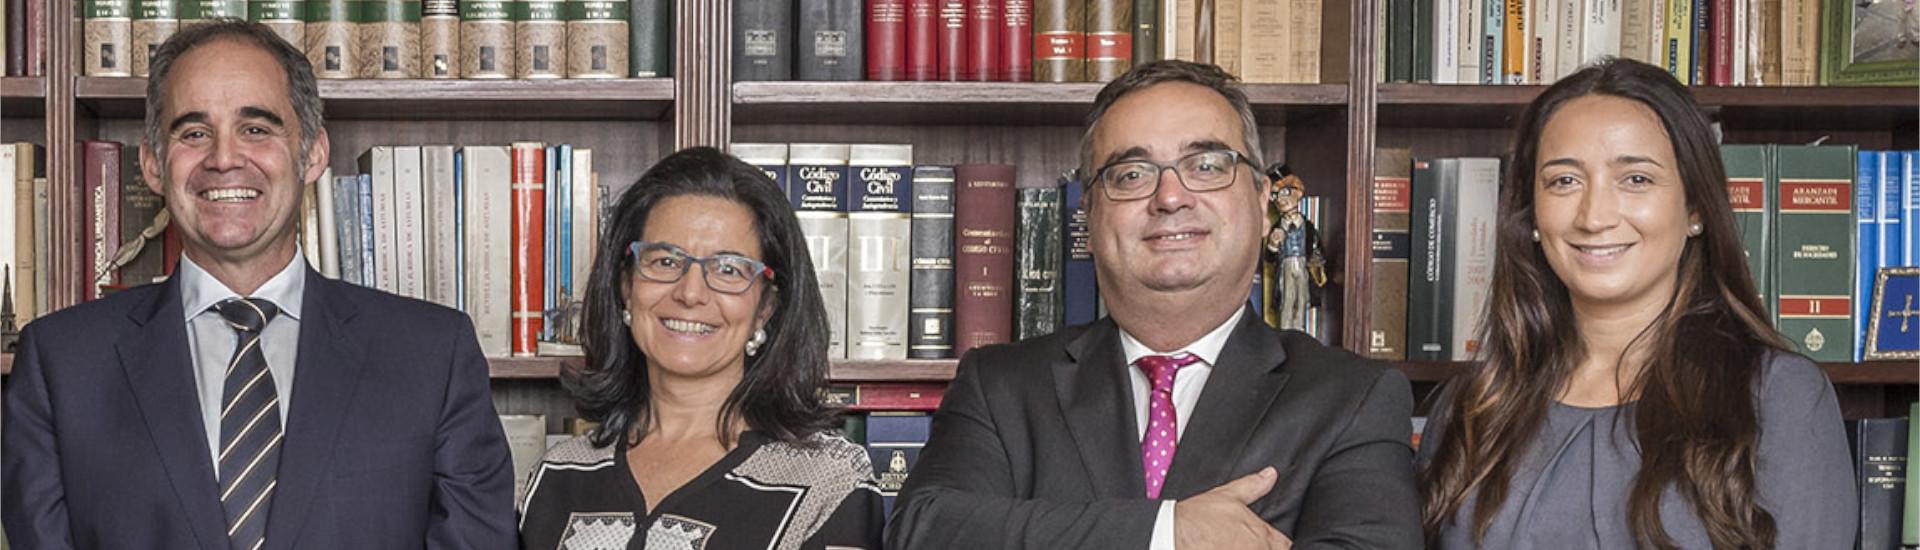 Vallaure-abogados